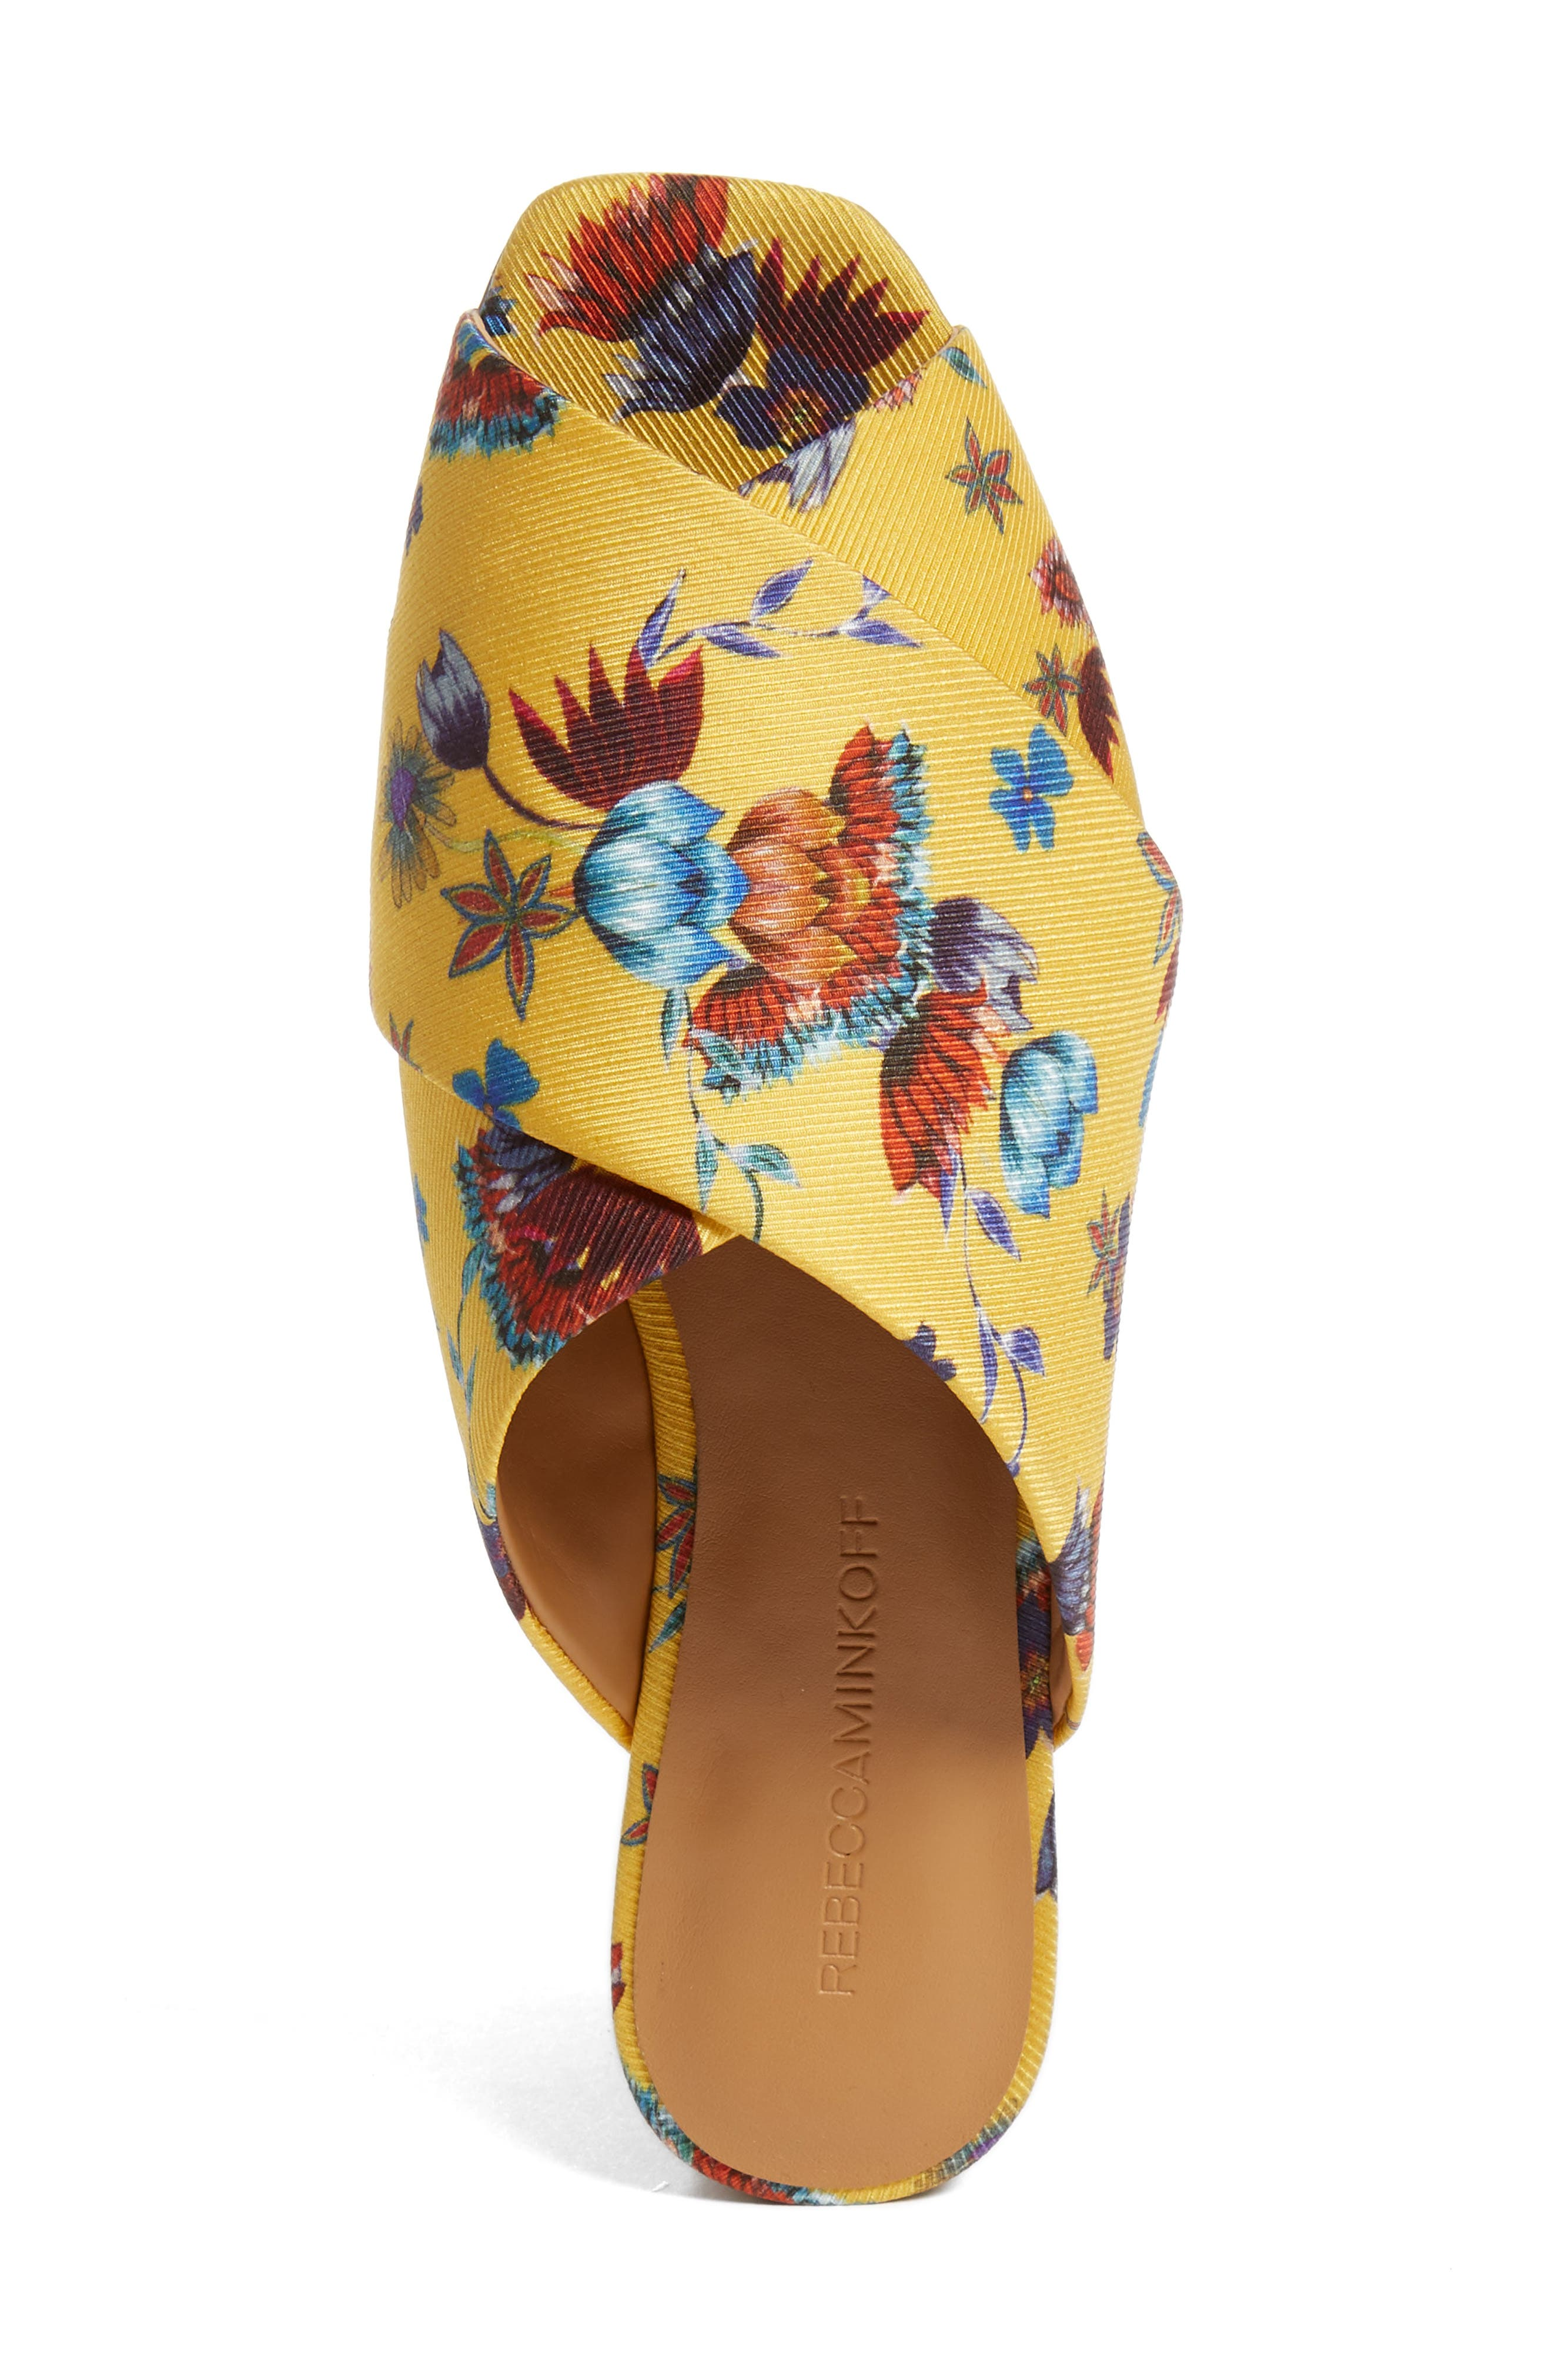 Anden Slide Sandal,                             Alternate thumbnail 5, color,                             Butterscotch Multi Print Silk